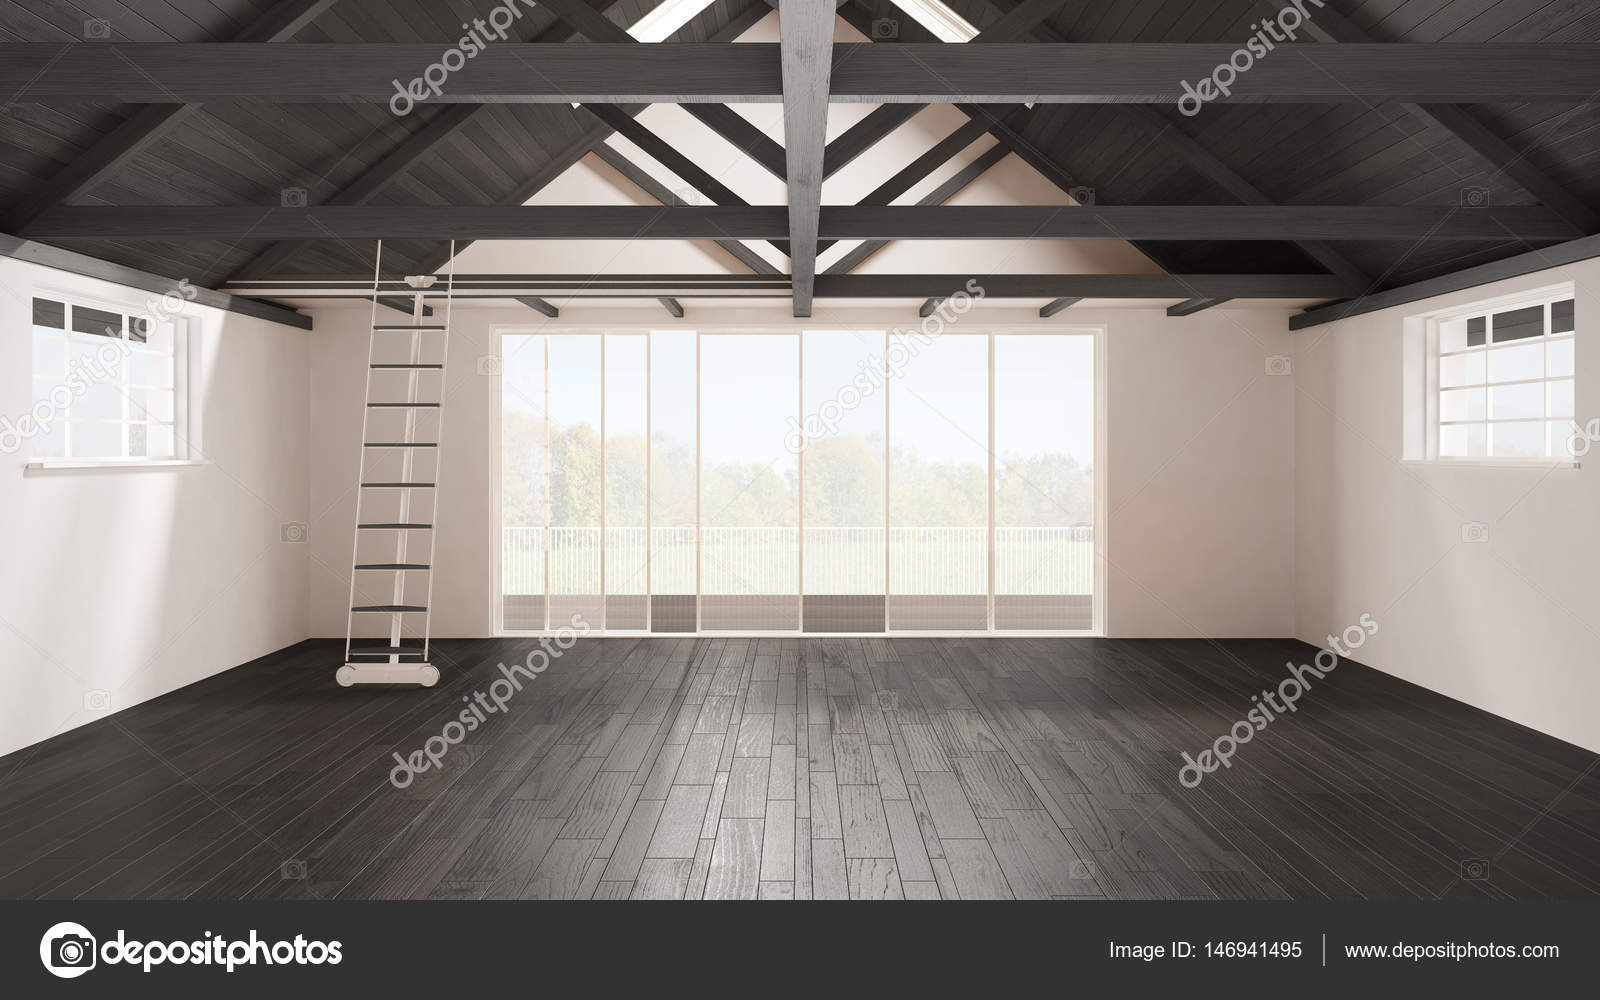 Minimalistische mezzanine loft lege industriële ruimte houten